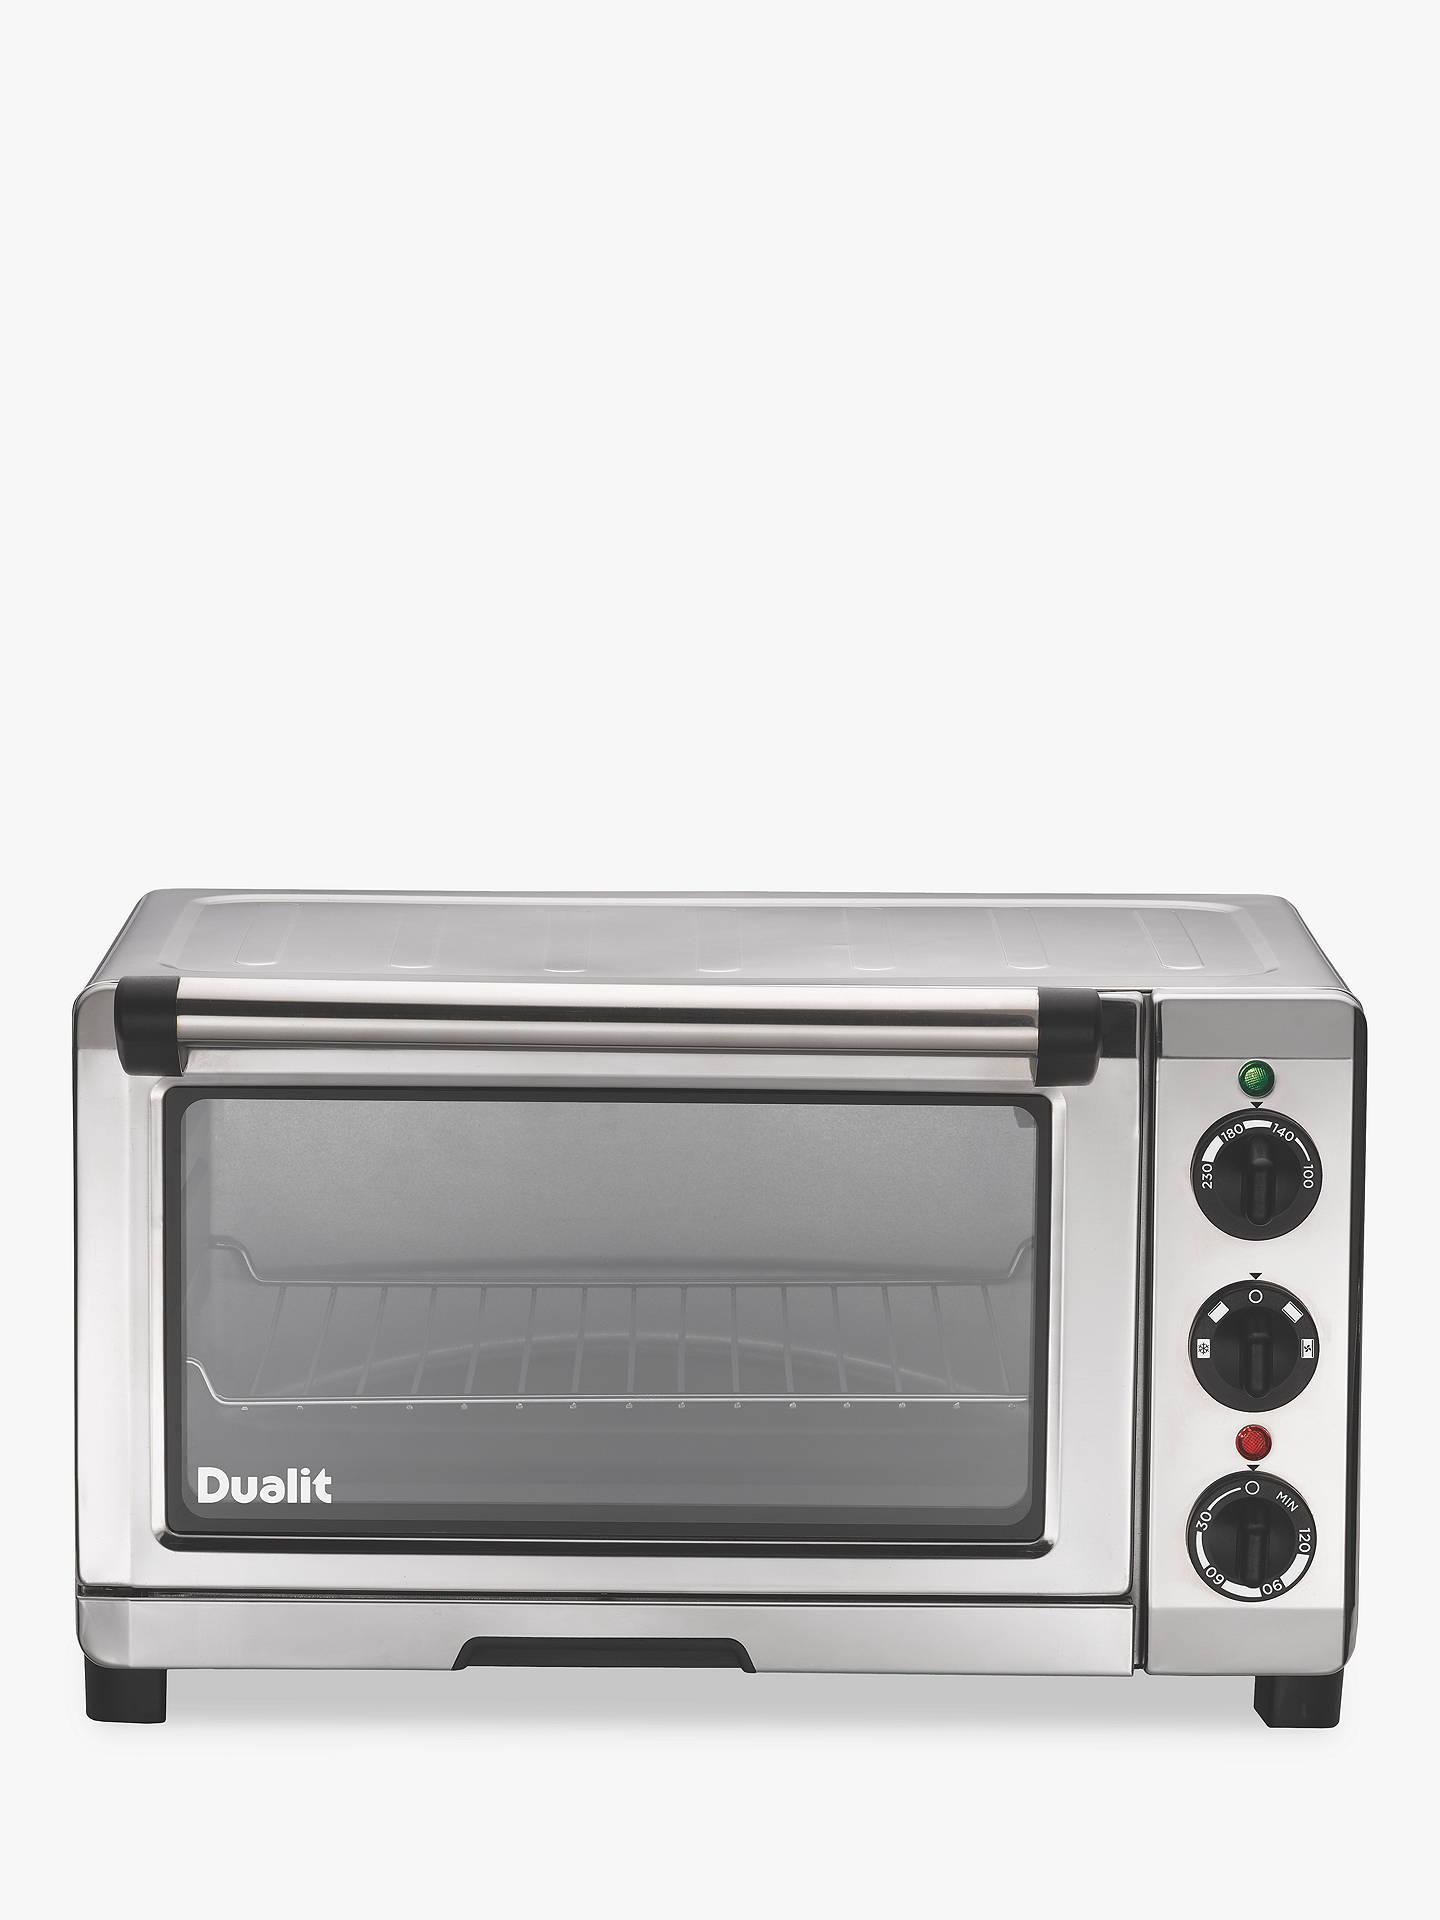 dualit 89200 mini oven chrome at john lewis partners. Black Bedroom Furniture Sets. Home Design Ideas